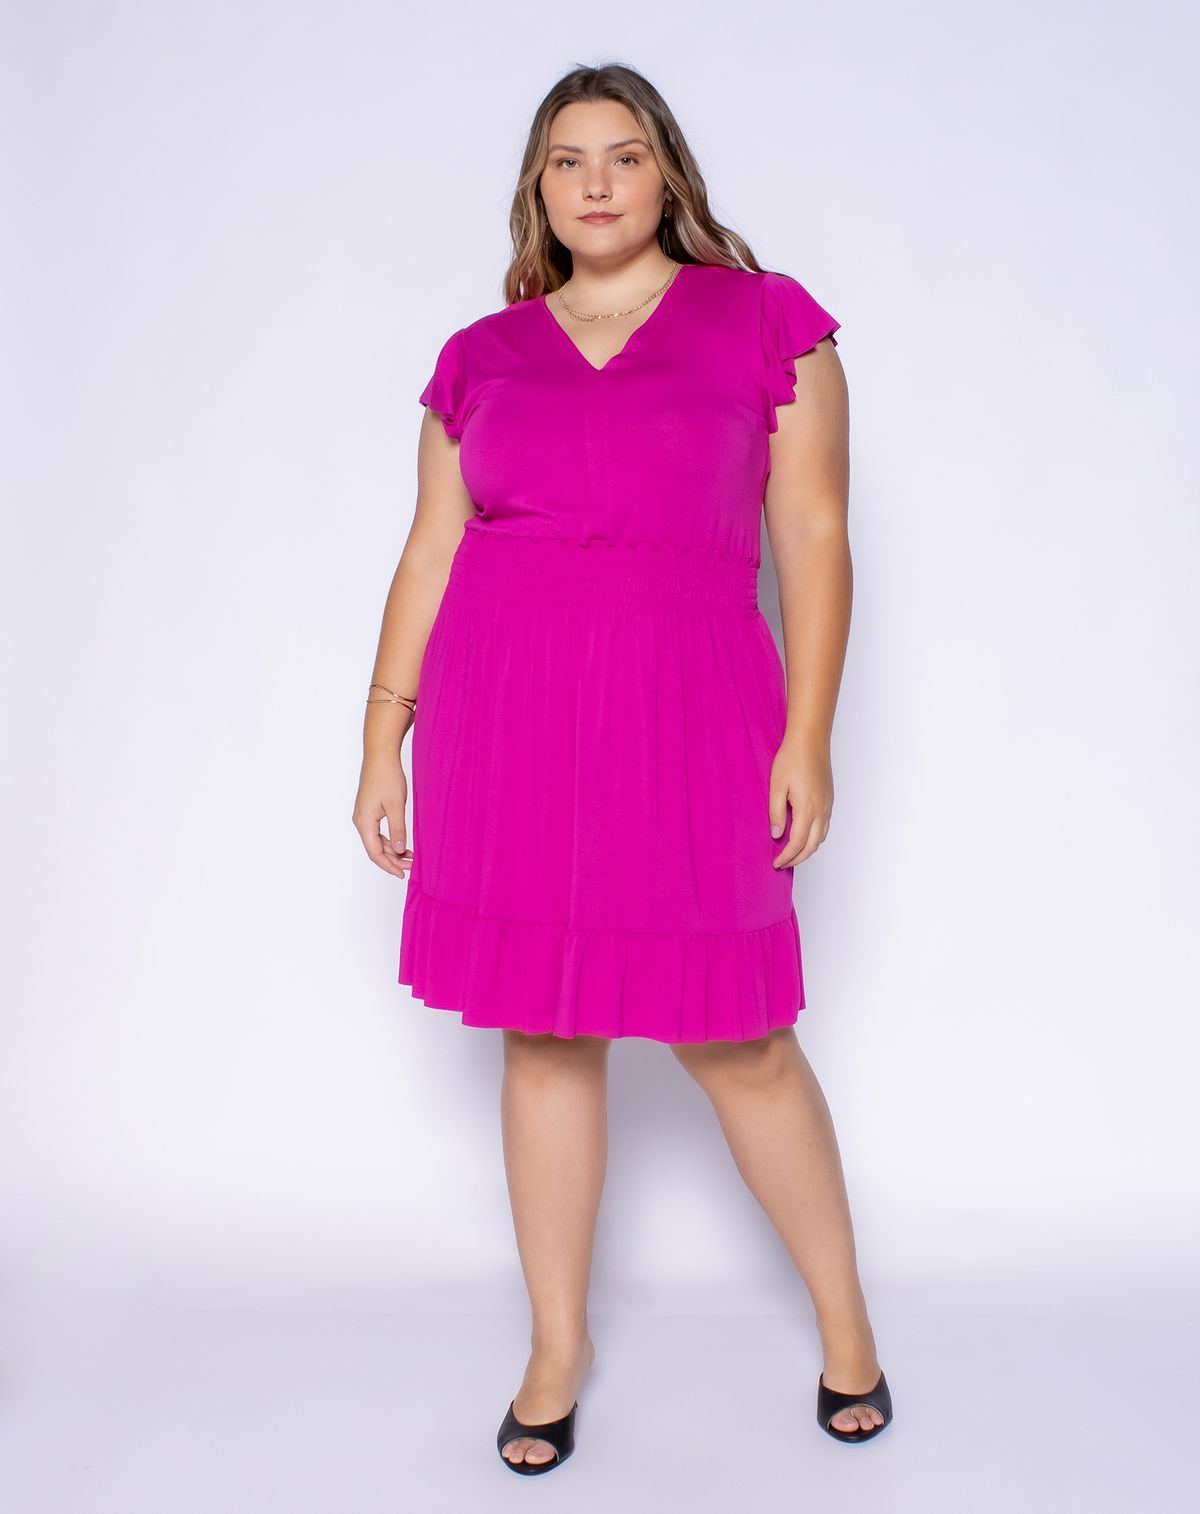 596680007-vestido-curto-plus-decote-v-babado-pink-g3-d14